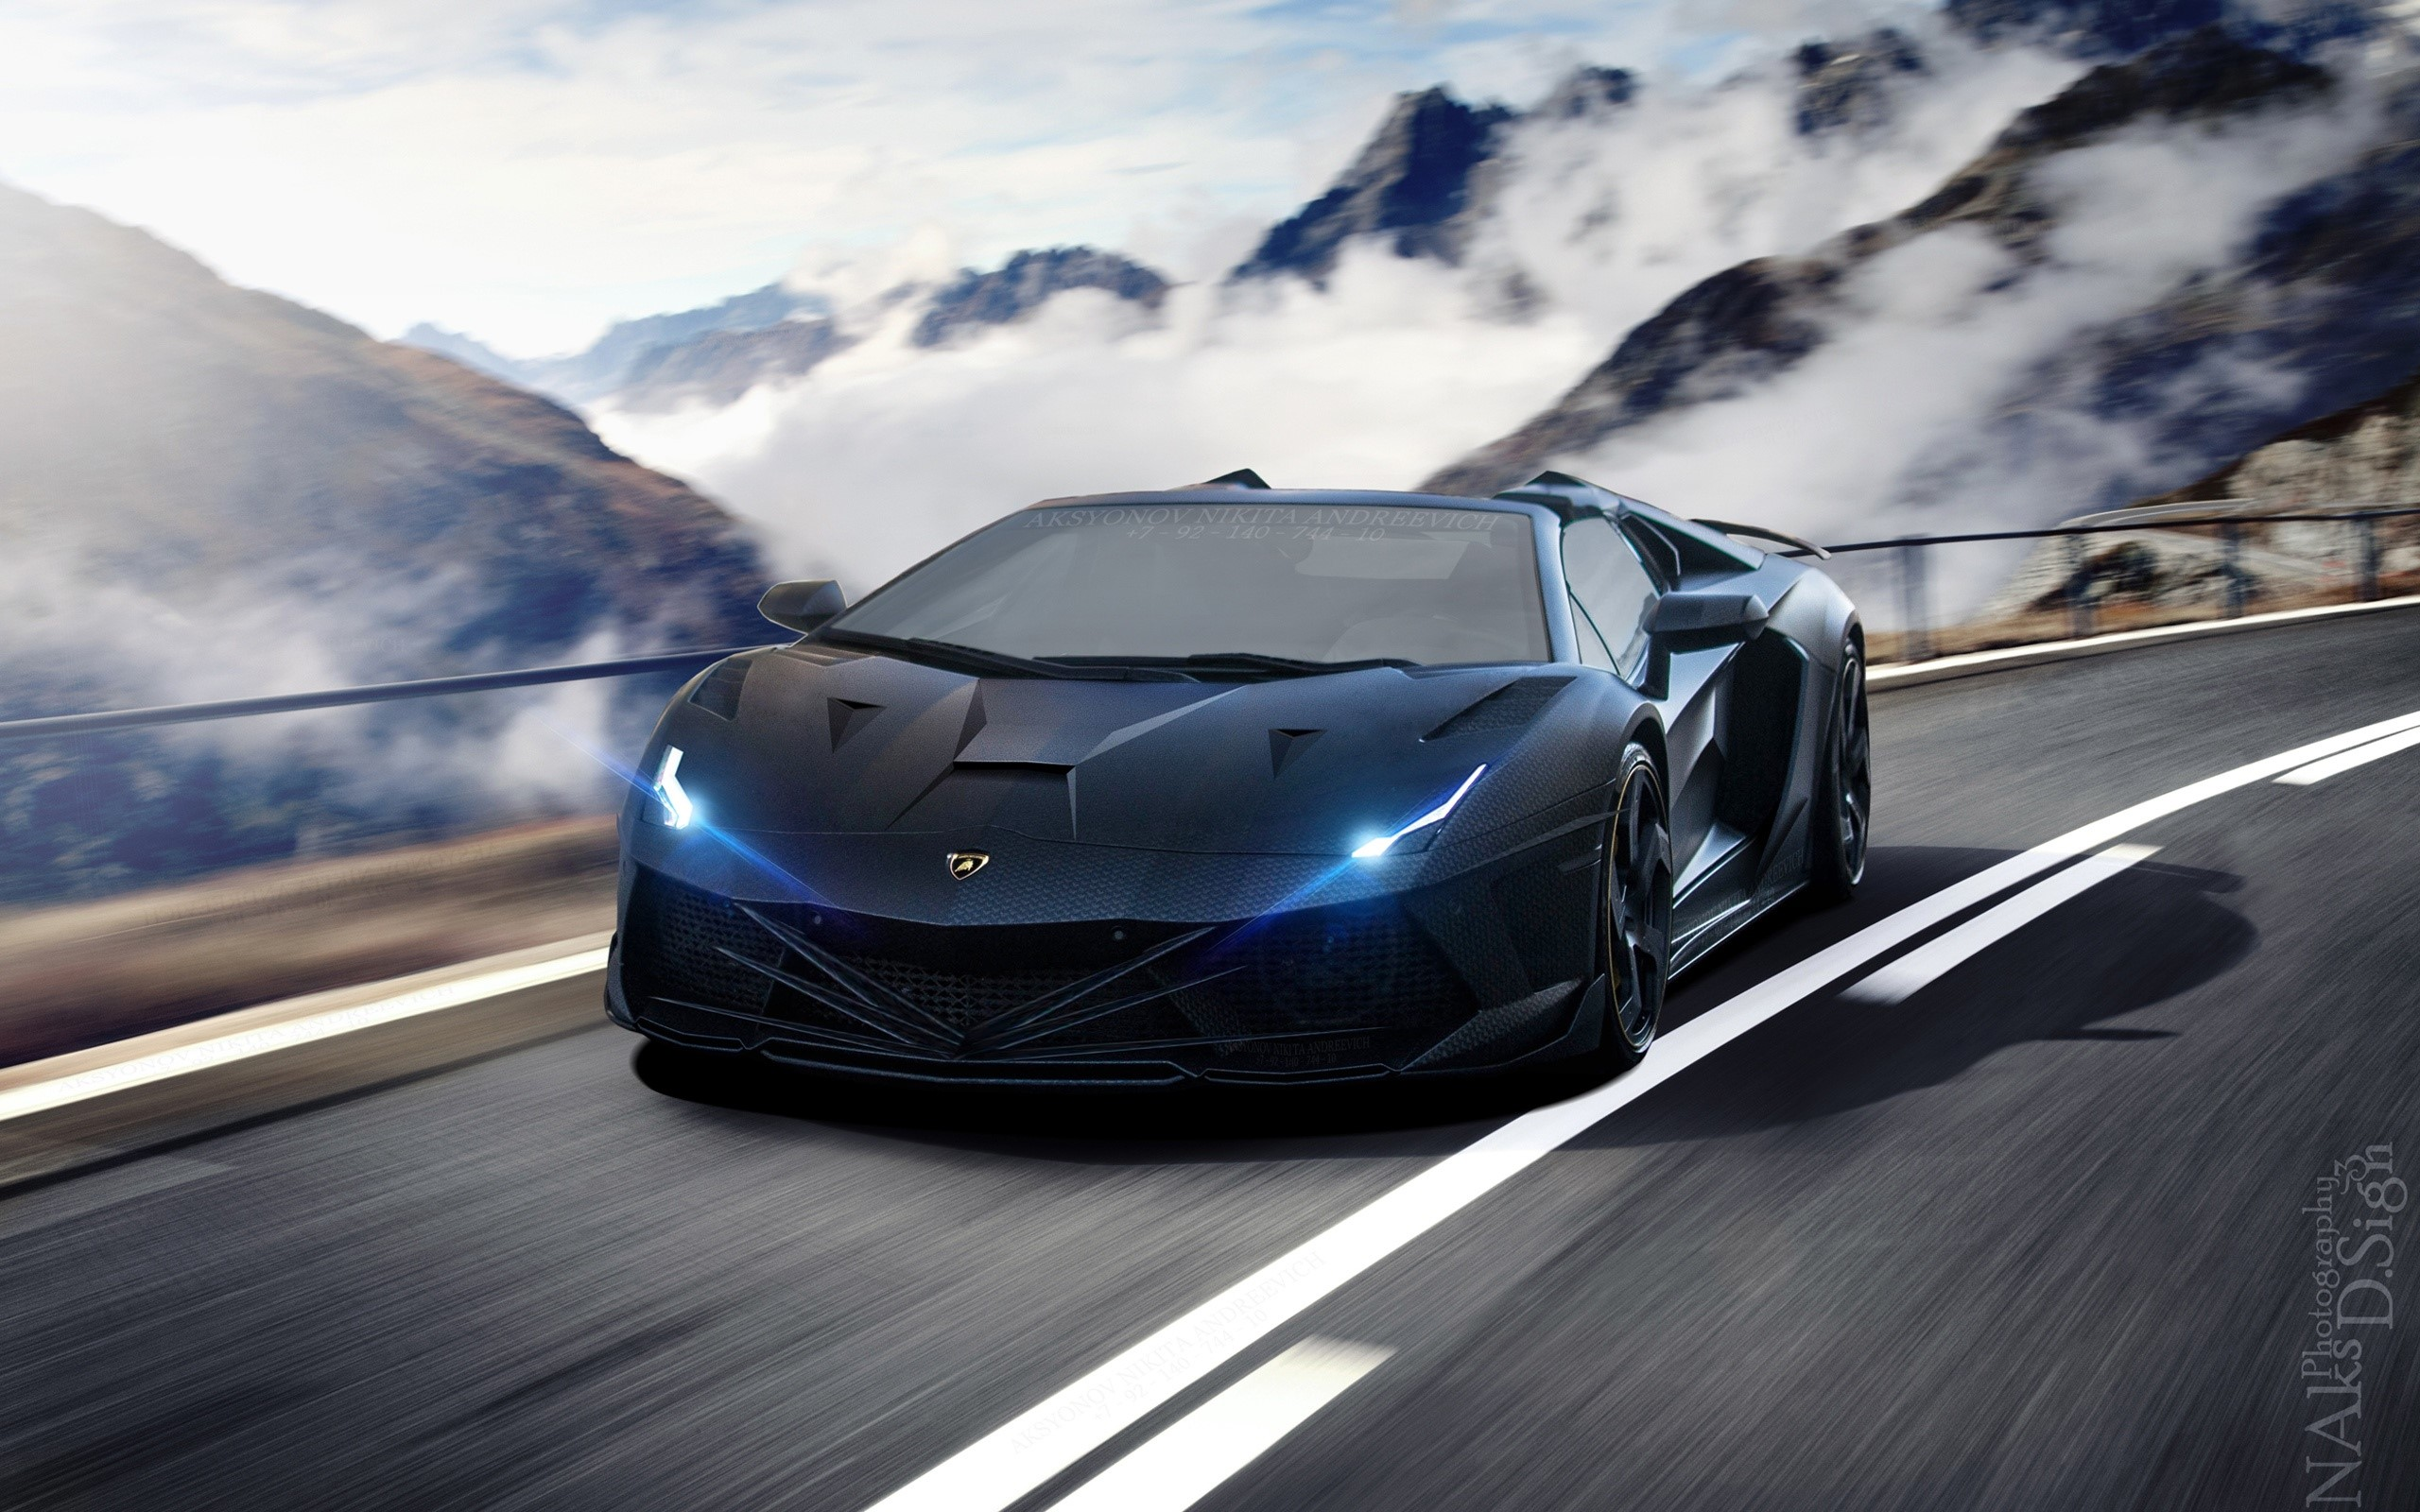 Wallpaper Insane Lamborghini Aventador